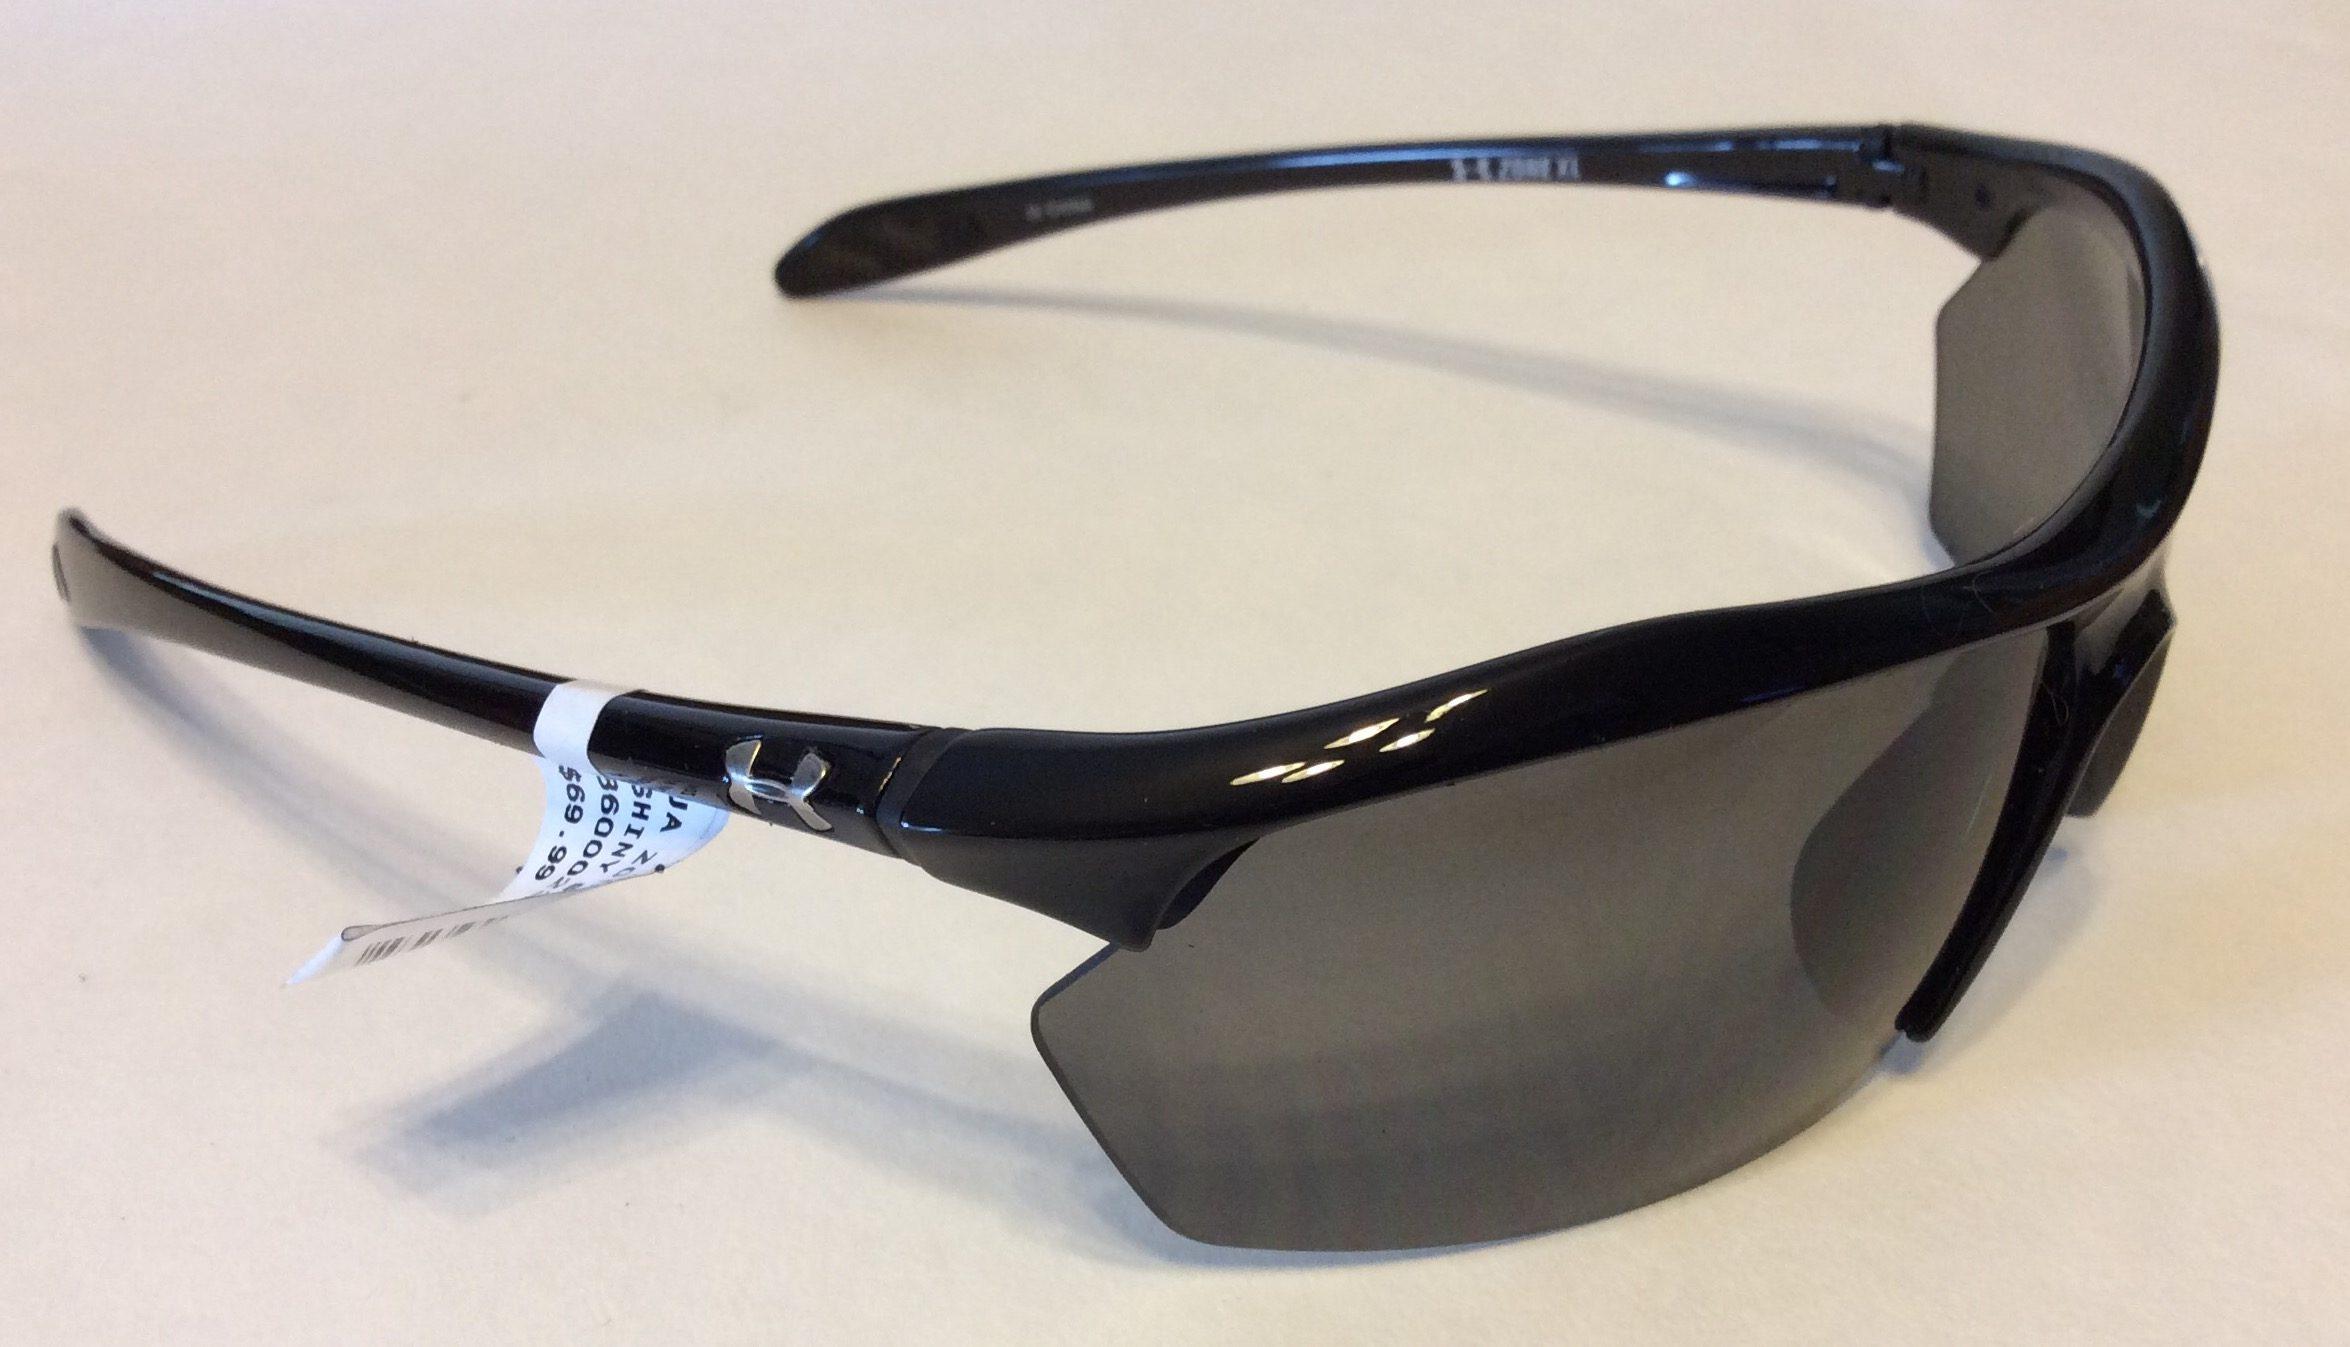 5d513cd262cc Under Armour Zone XL Sunglasses UA - Shiny Black - Gray 8600023-5100